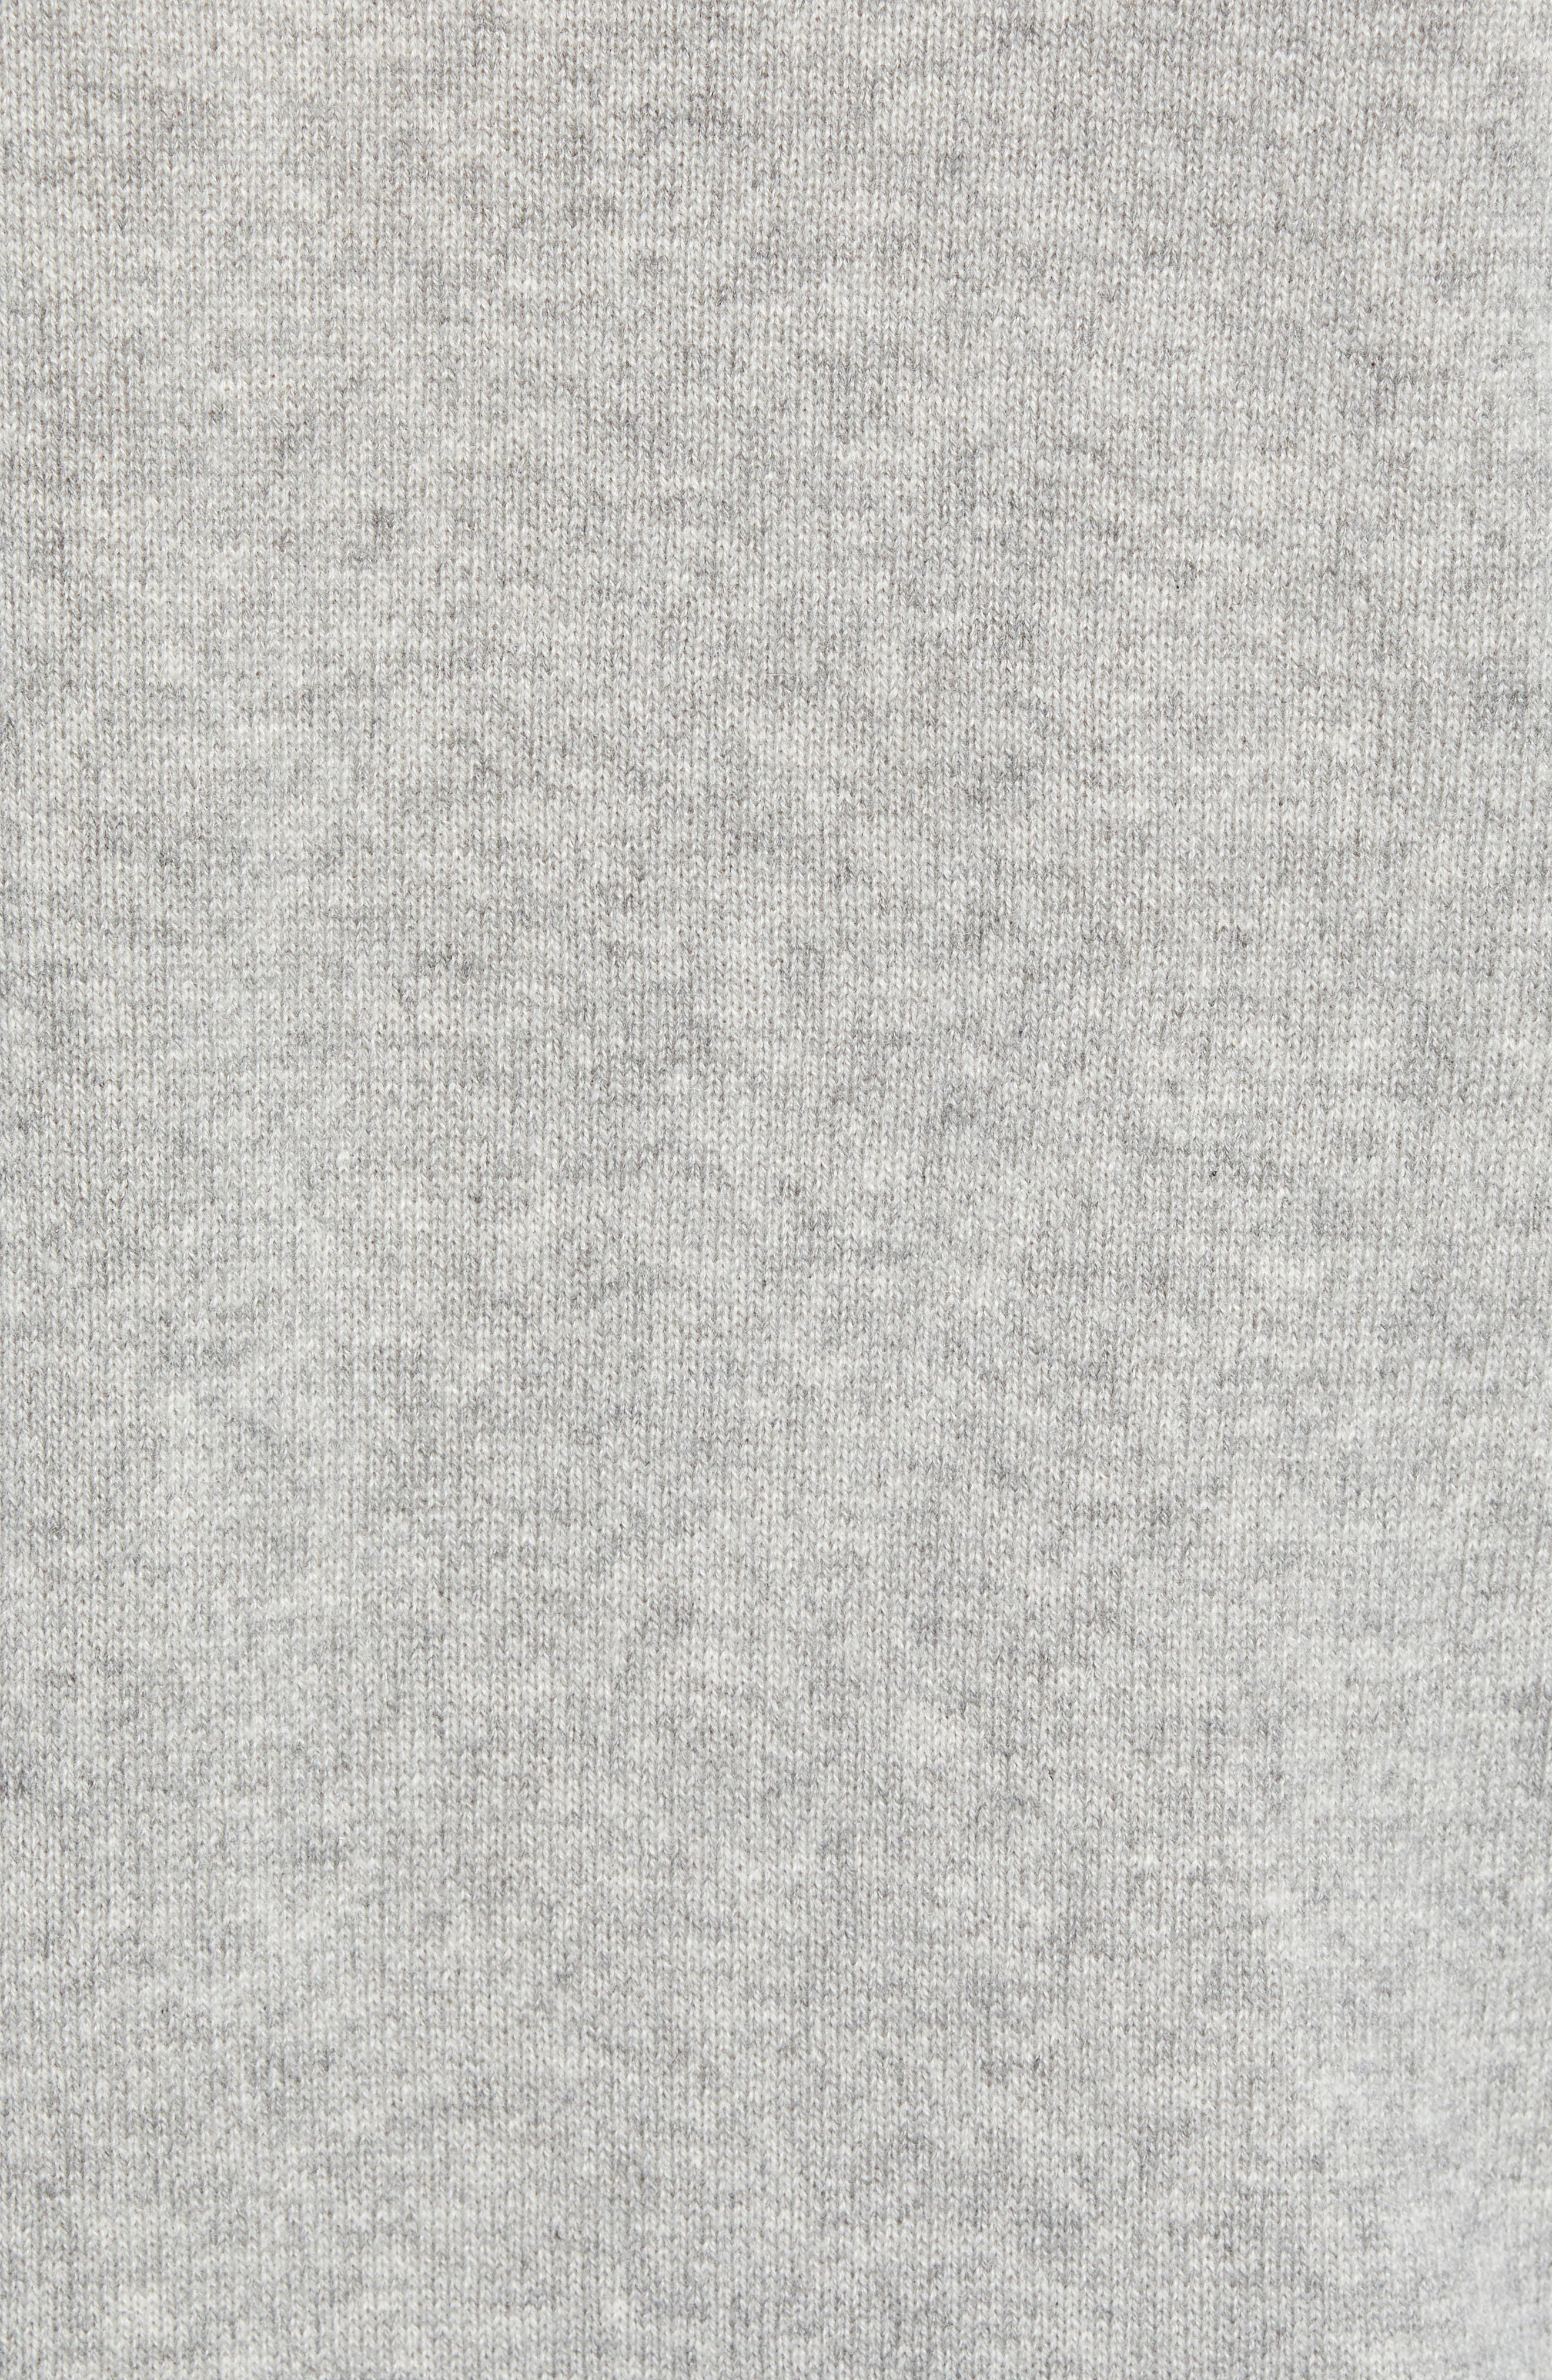 Everyday Cashmere Regular Fit Crewneck Sweater,                             Alternate thumbnail 5, color,                             HEATHER GREY